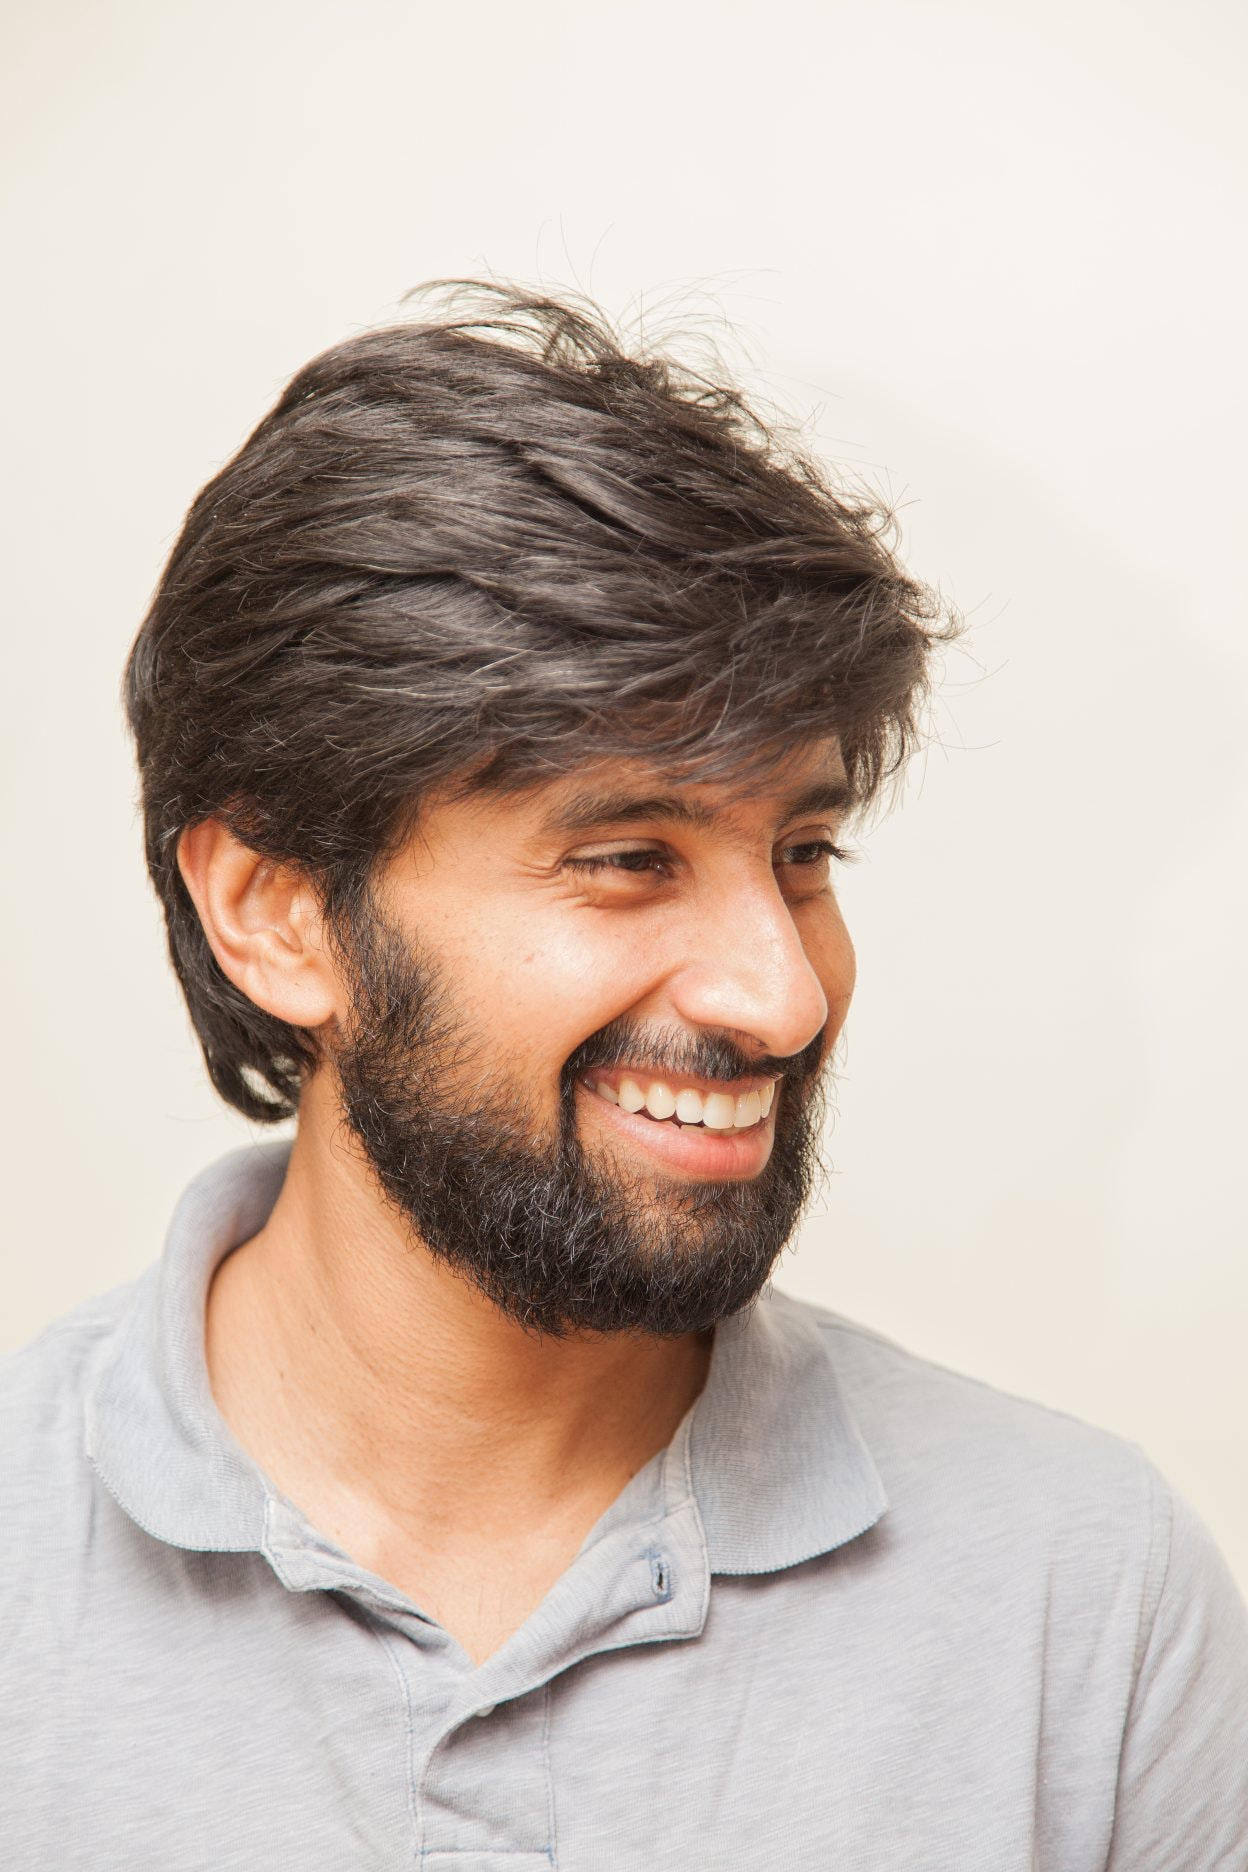 Go to siddharth narsimhan's profile